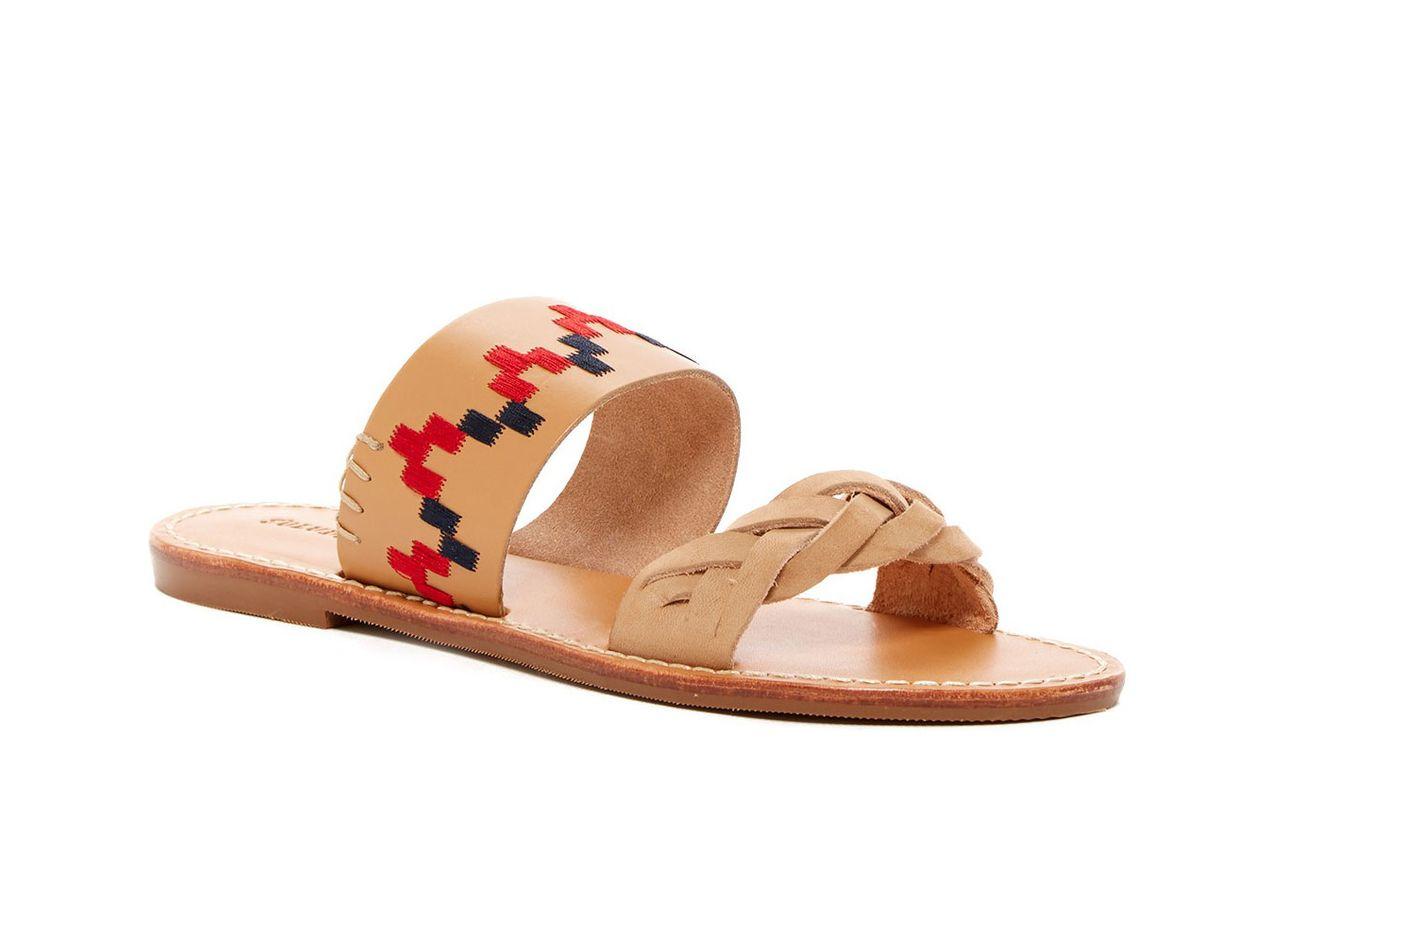 Soludos Embroidered Braided Slide Sandal